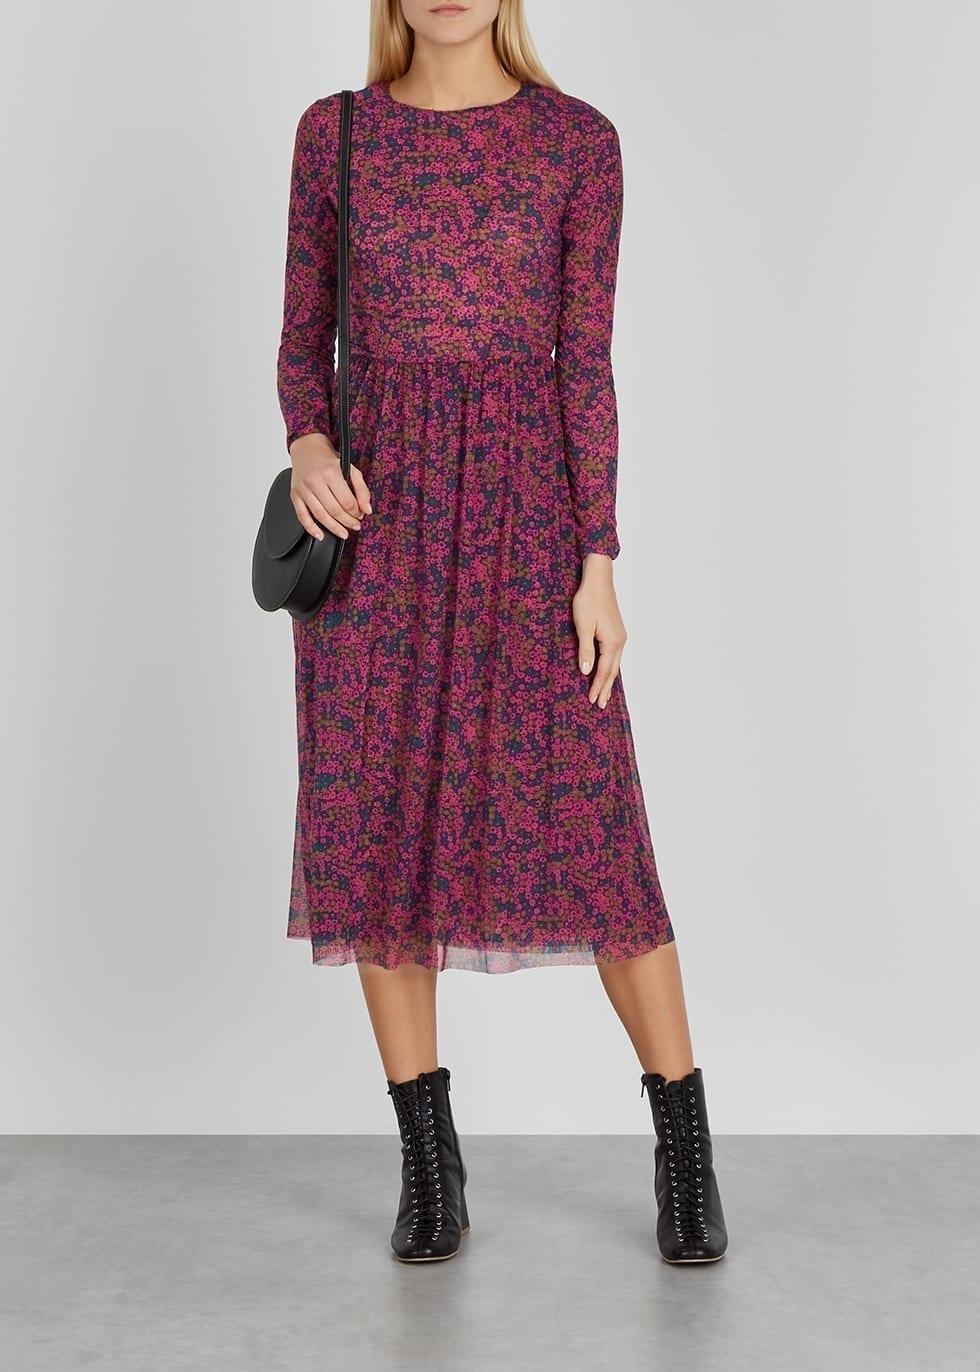 SAMSØE & SAMSØE Vivi Floral-print Mesh Midi Dress